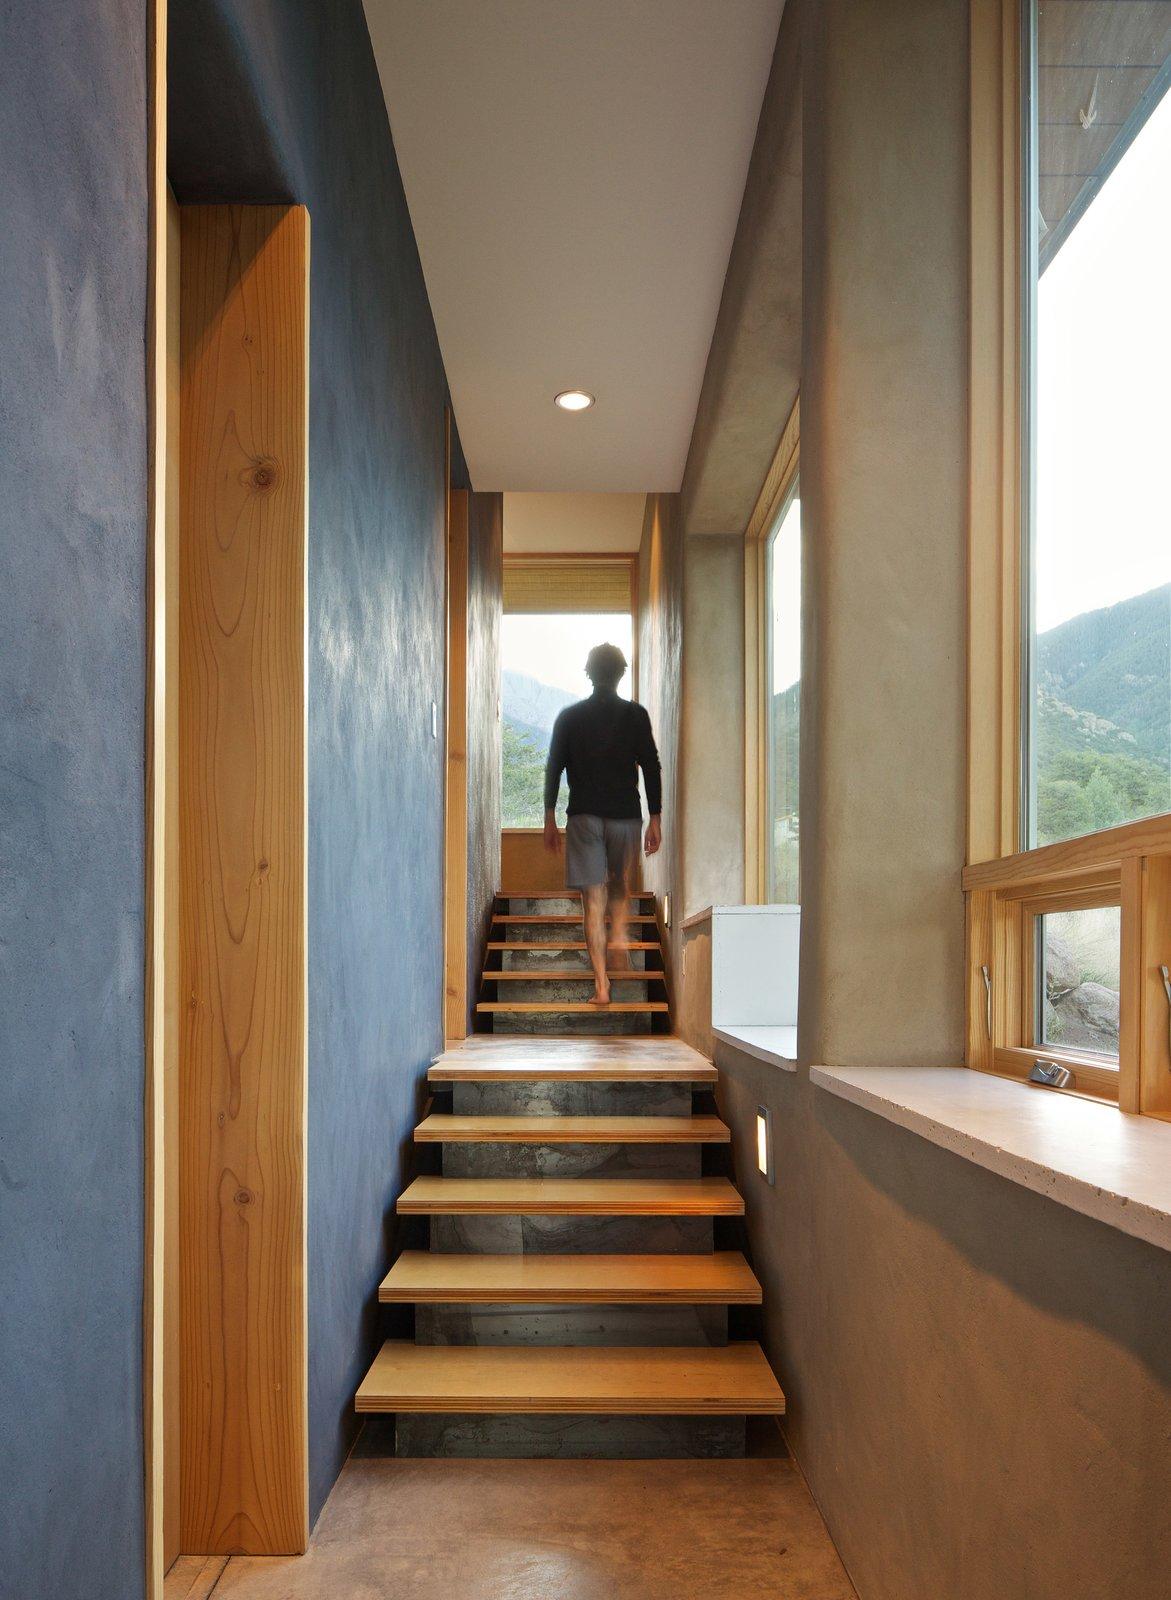 Strawbale Getaway by Gettliffe Architecture